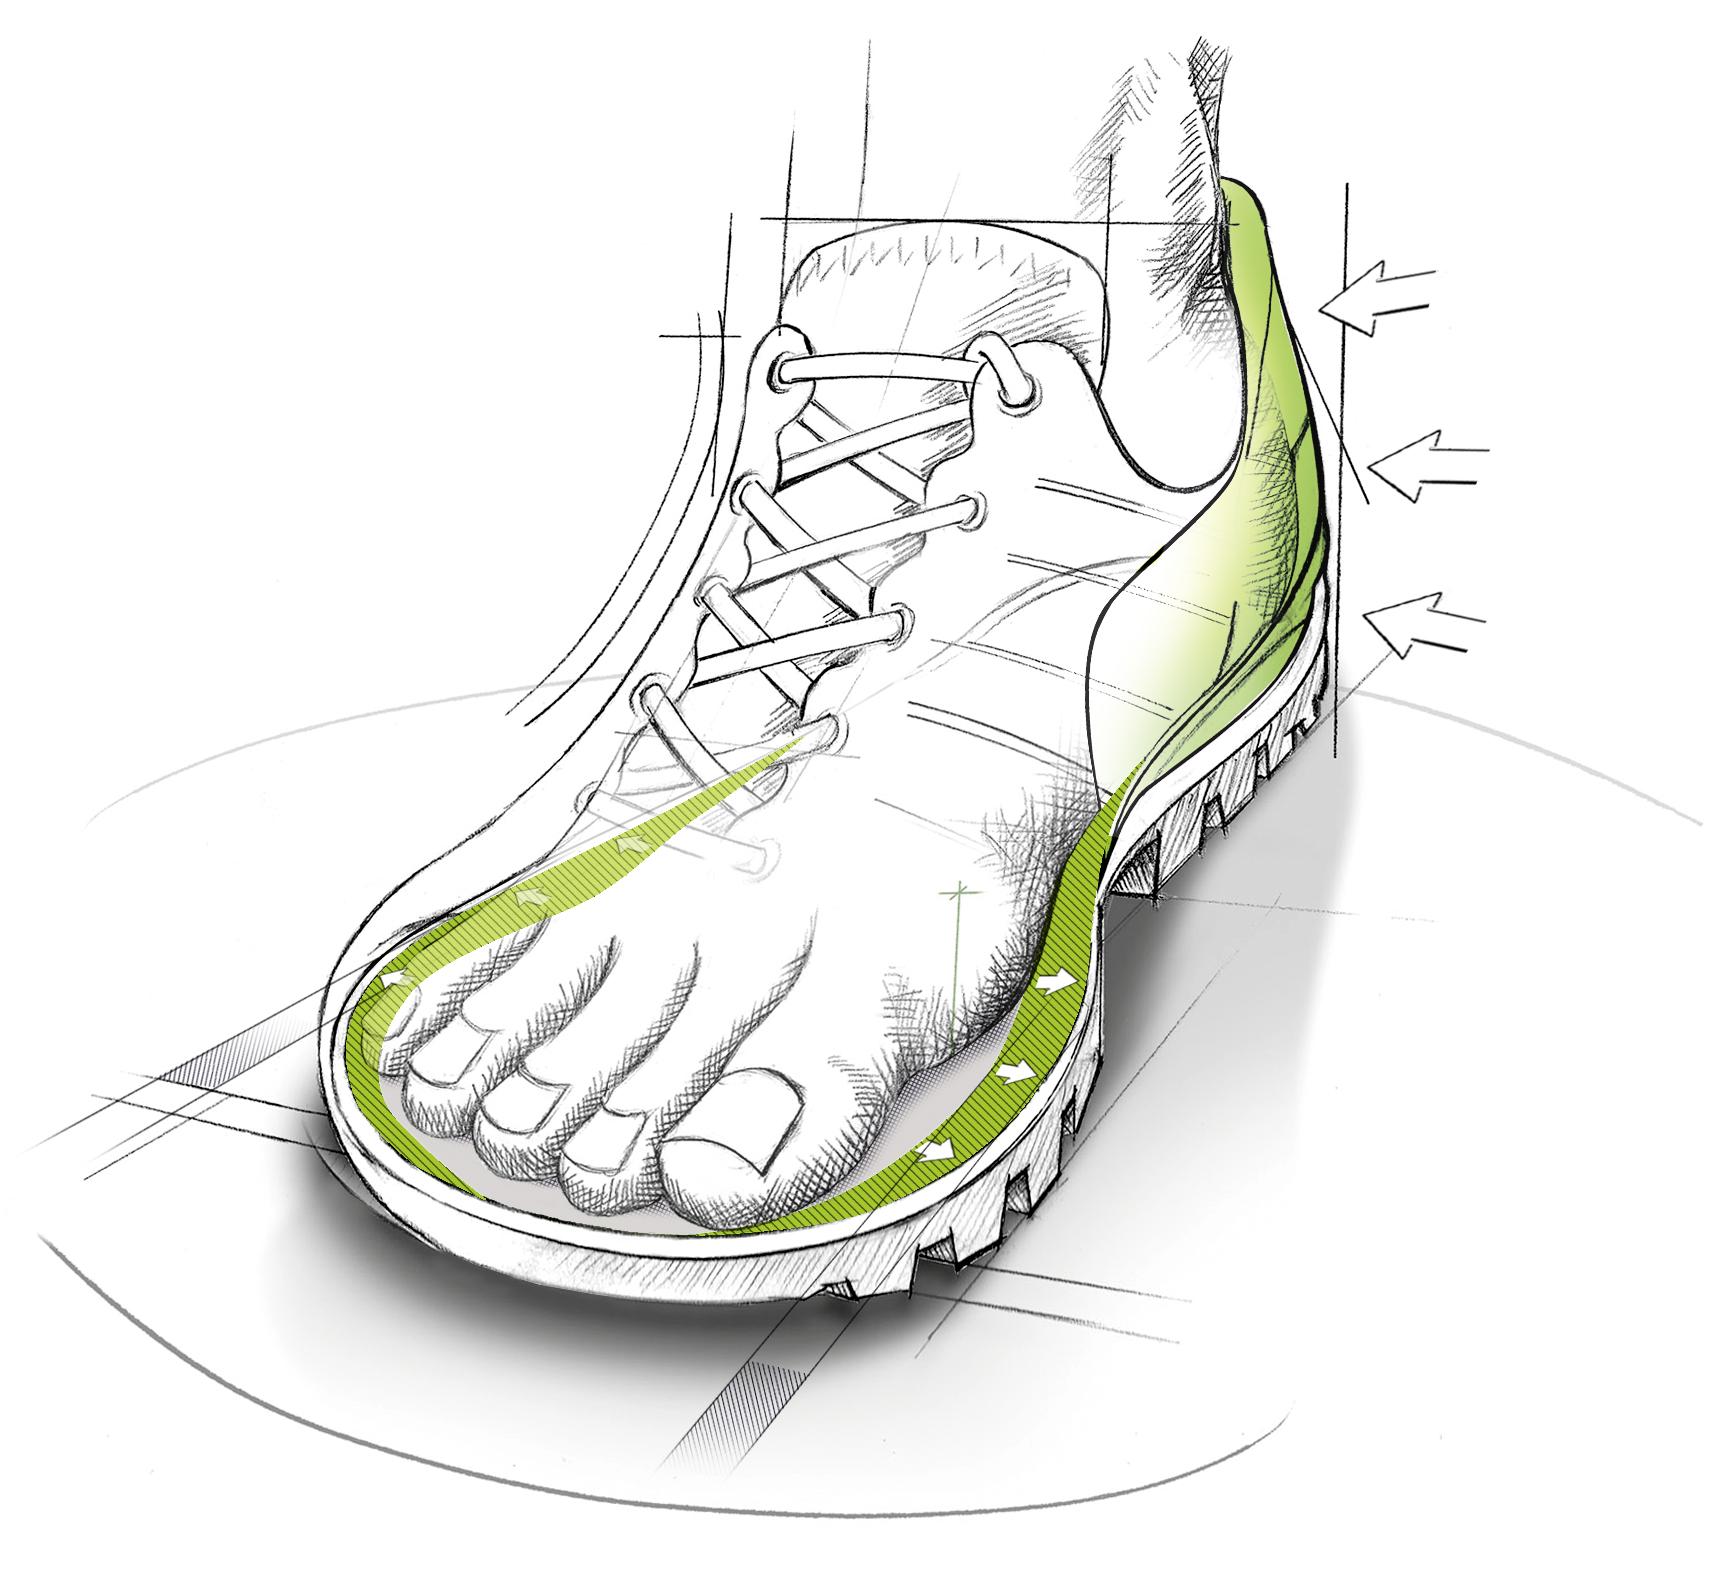 3dfe819dd0c Models - Special trekking boots men & women | Meindl - Shoes For Actives